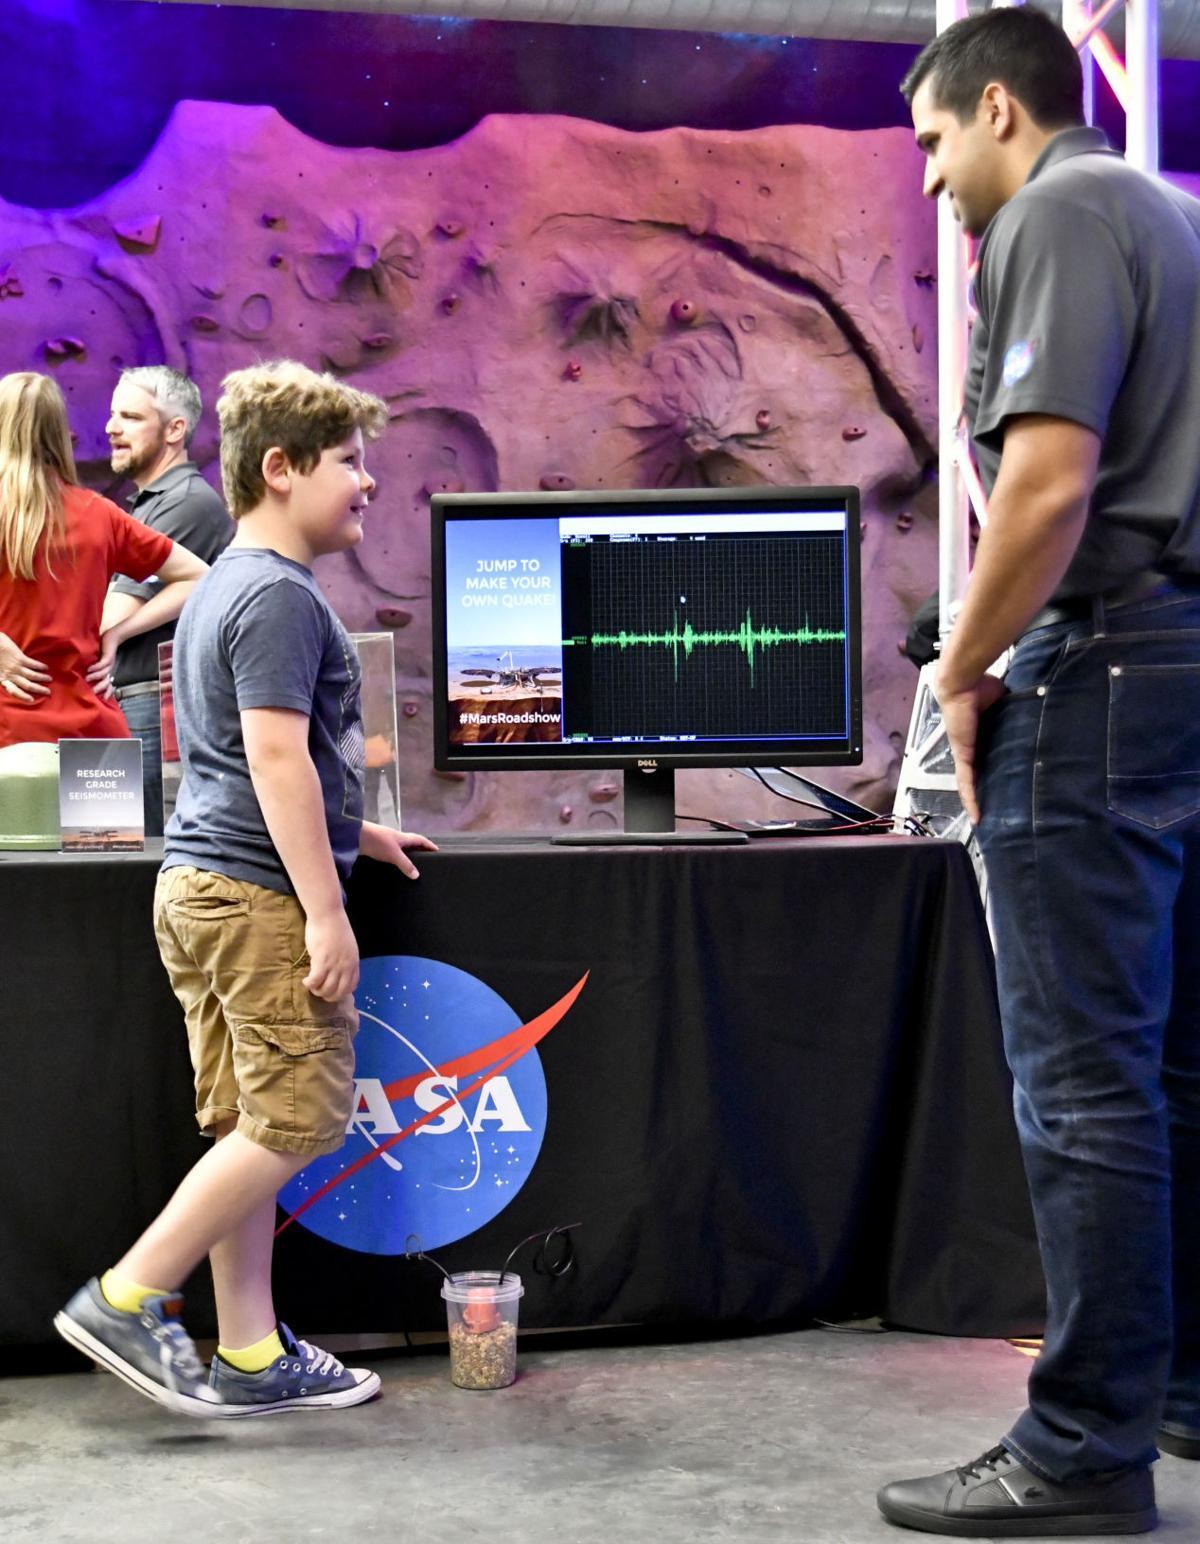 050218 Mars Discovery 02.jpg